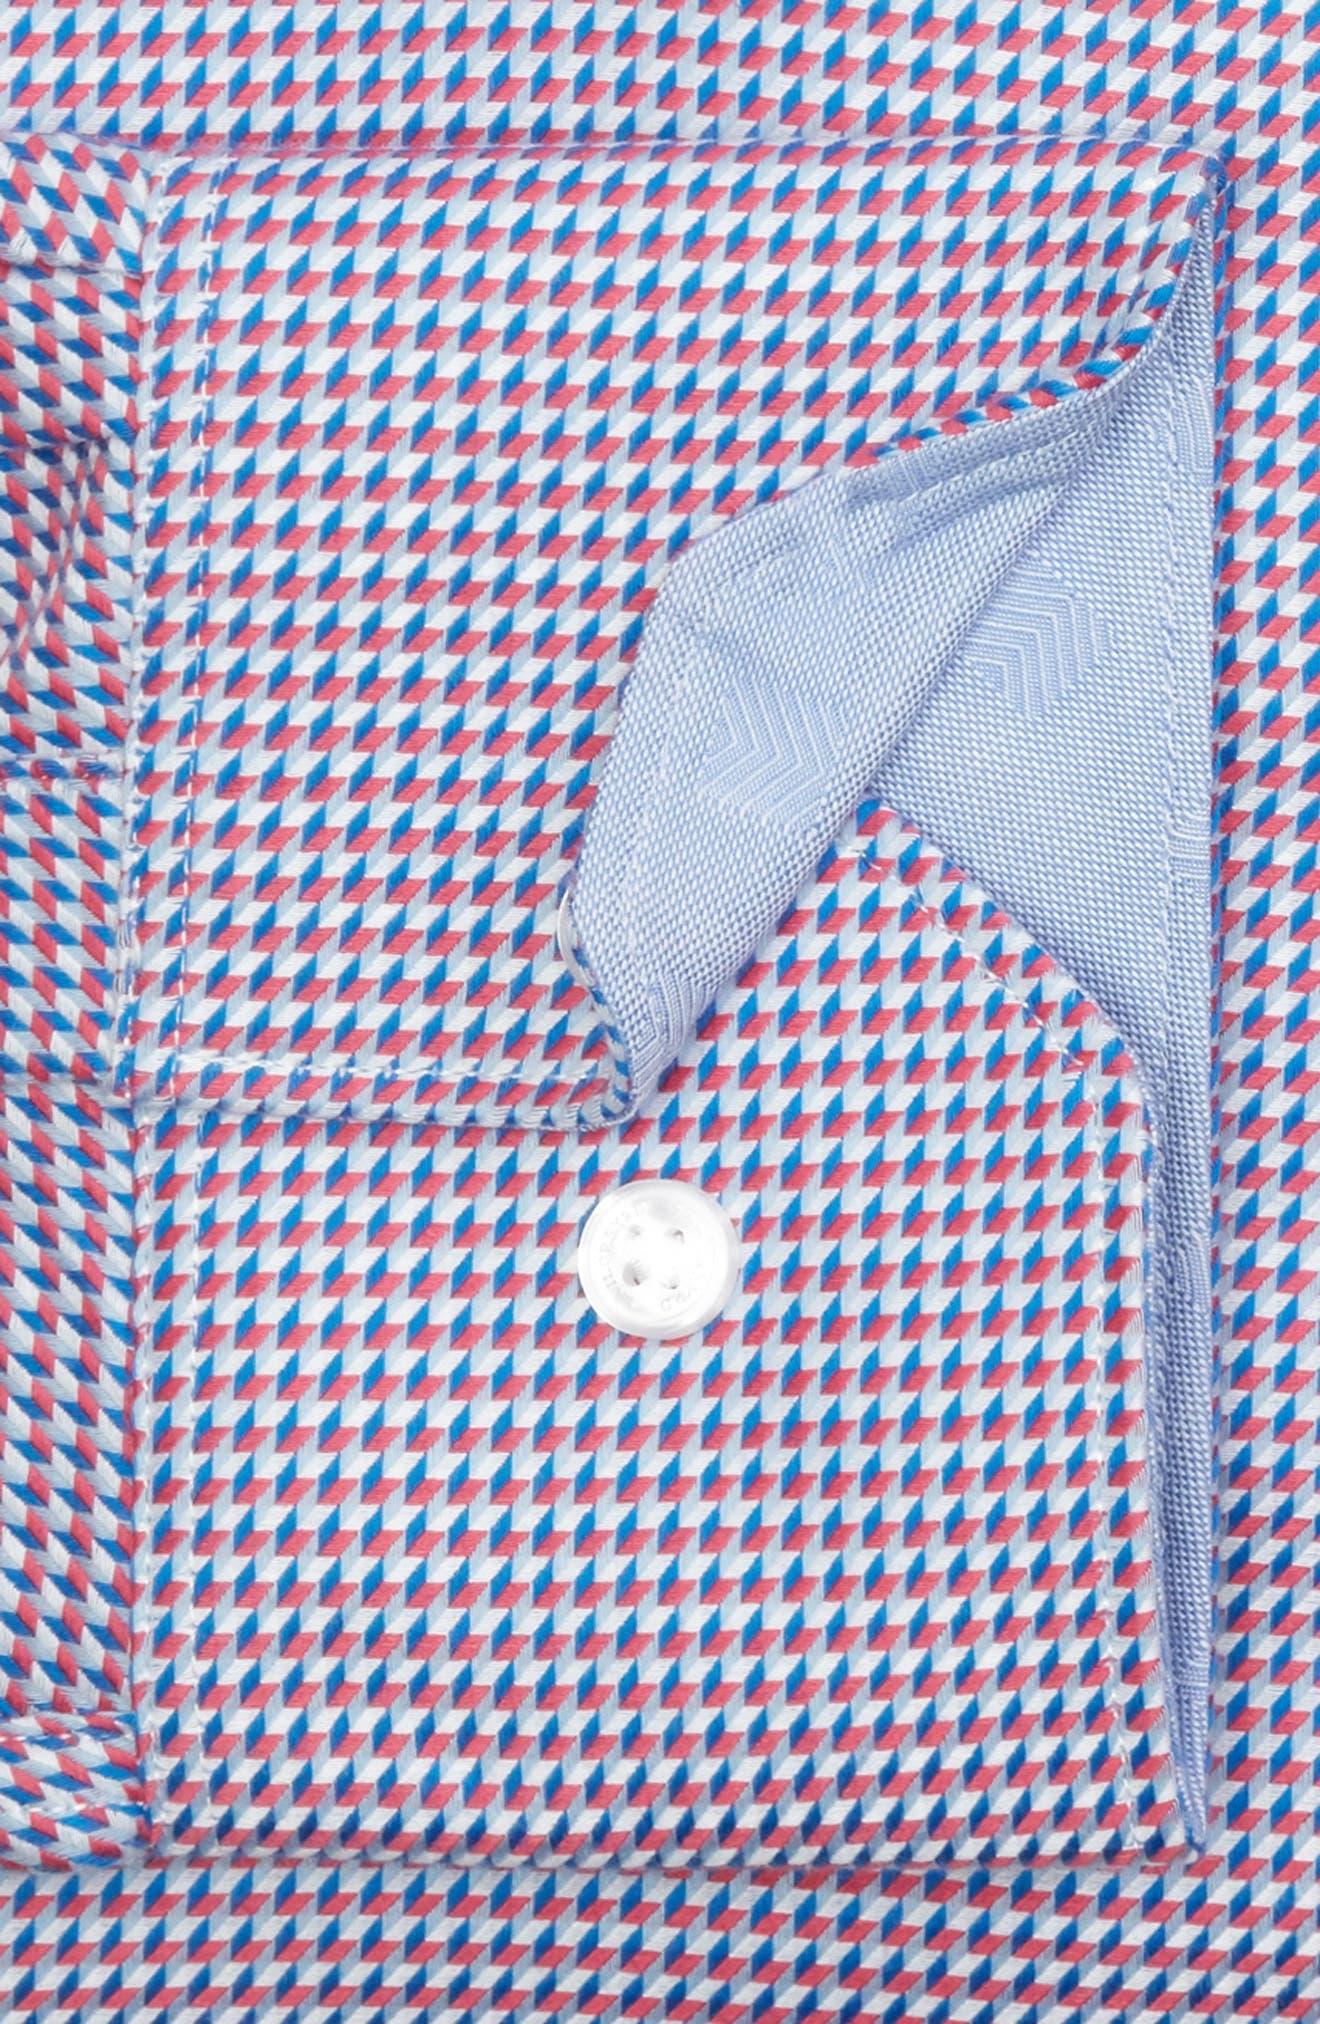 Axton Trim Fit Geometric Dress Shirt,                             Alternate thumbnail 5, color,                             Red/ Blue